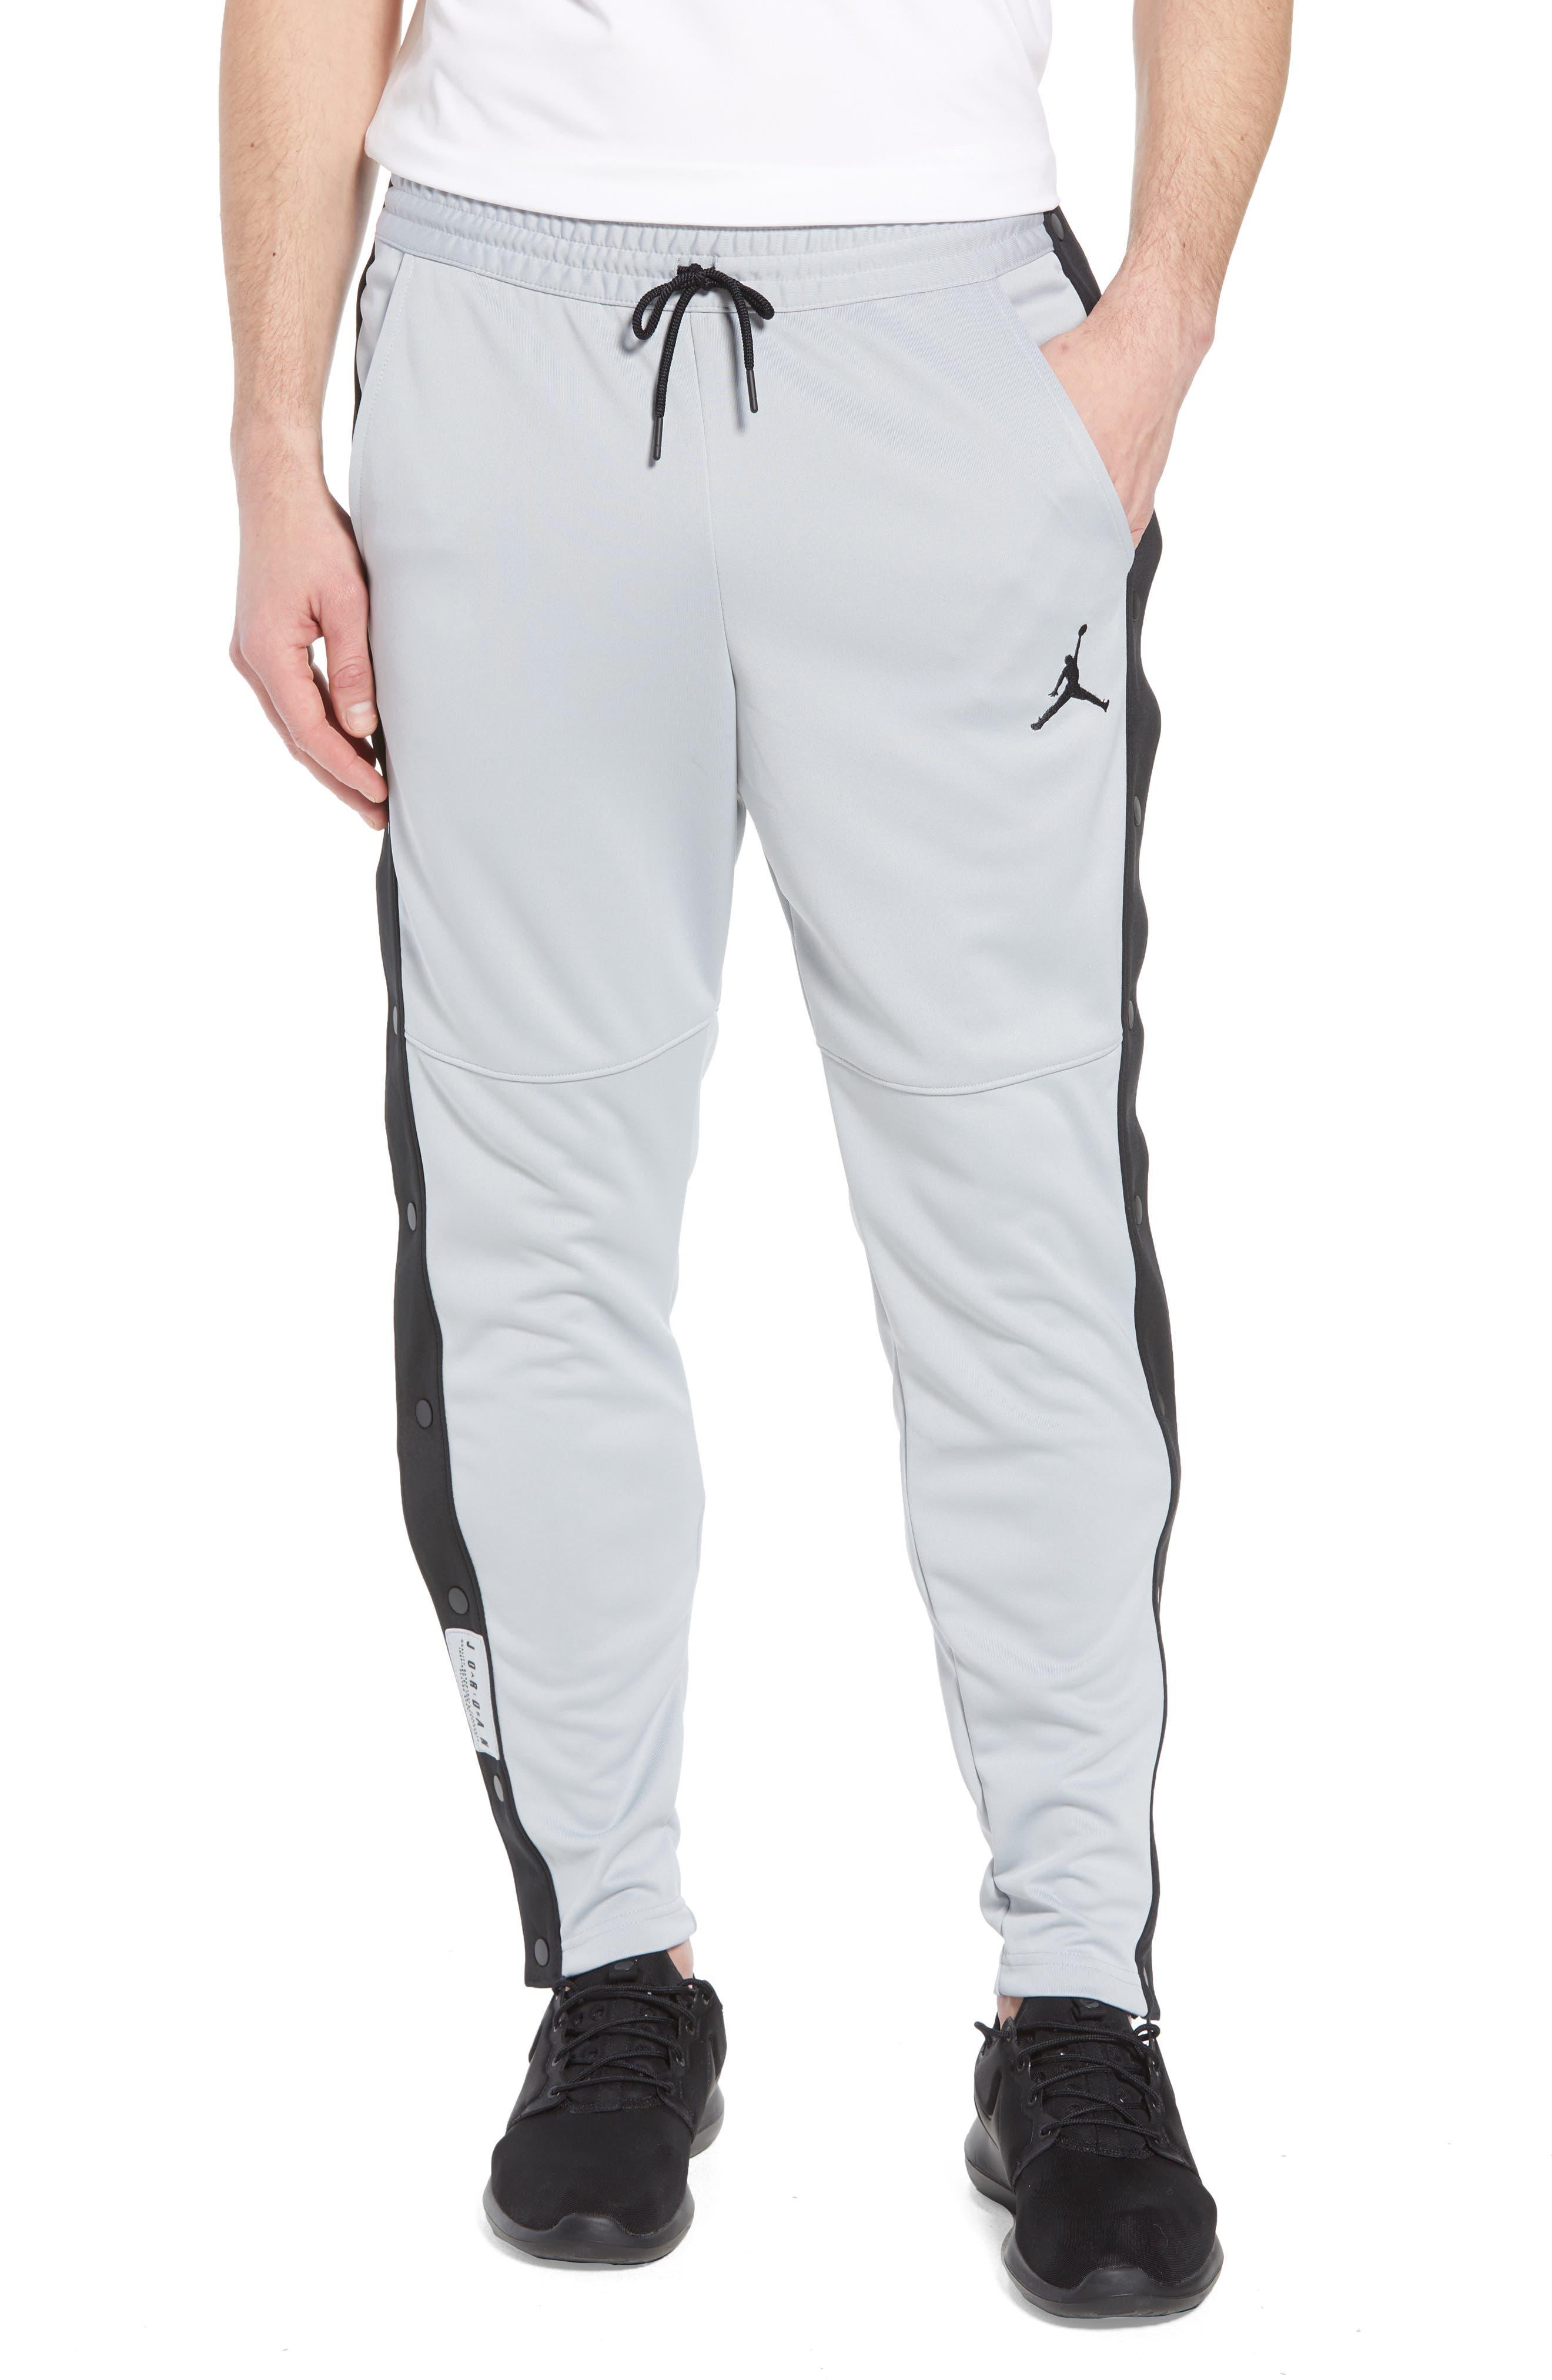 Rise Tear-Away Jogger Pants,                         Main,                         color, Wolf Grey/ Black